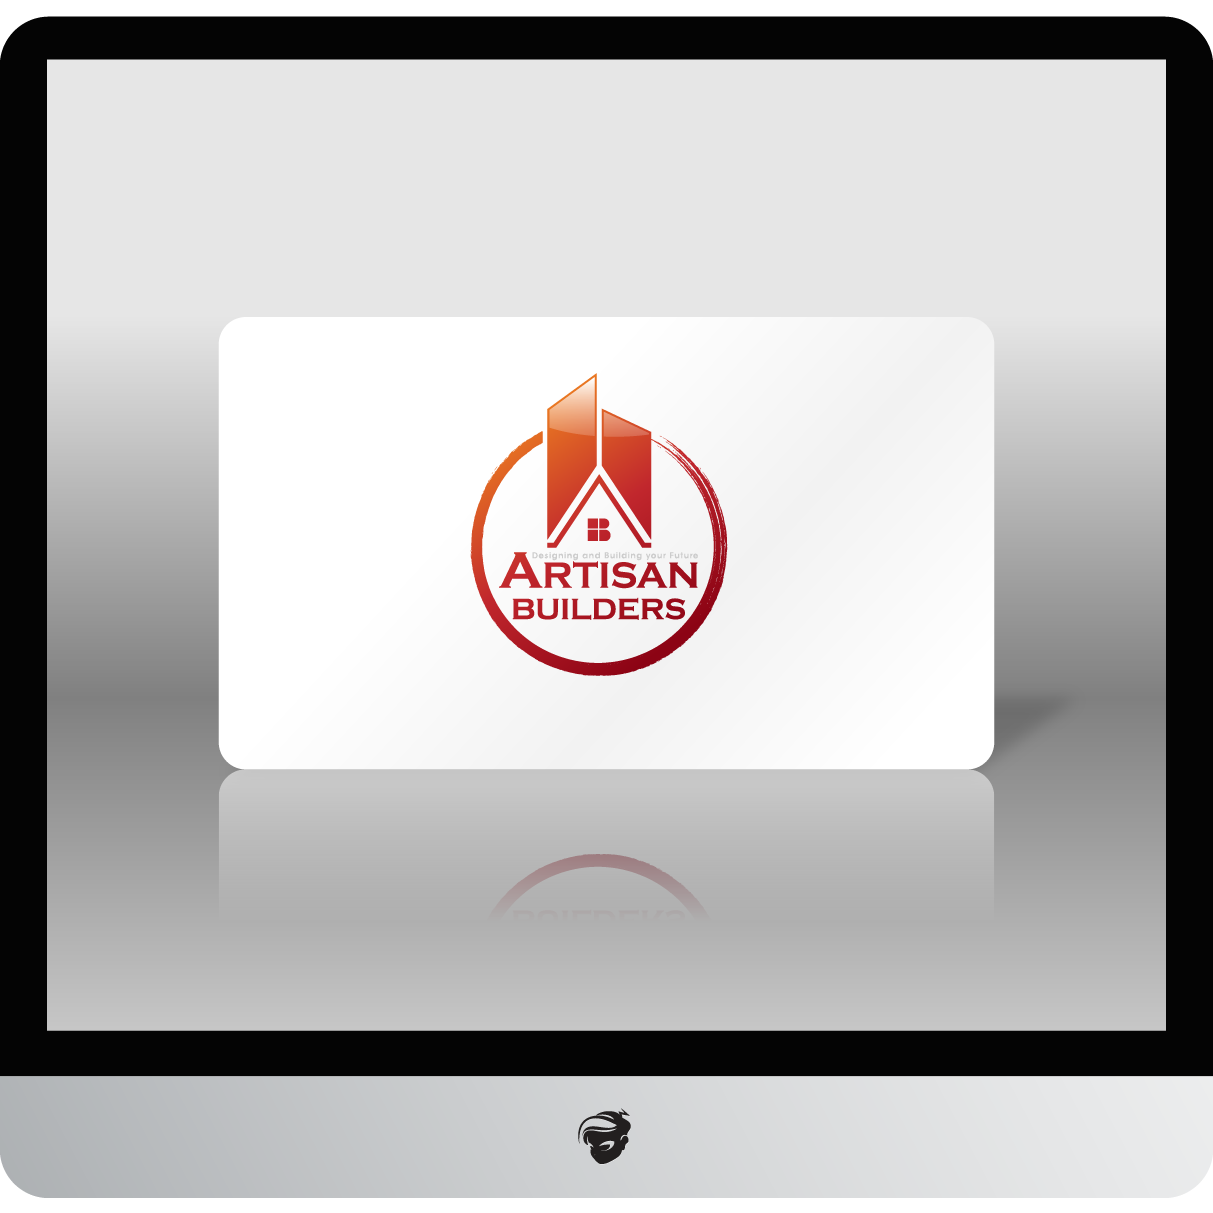 Logo Design by zesthar - Entry No. 226 in the Logo Design Contest Captivating Logo Design for Artisan Builders.